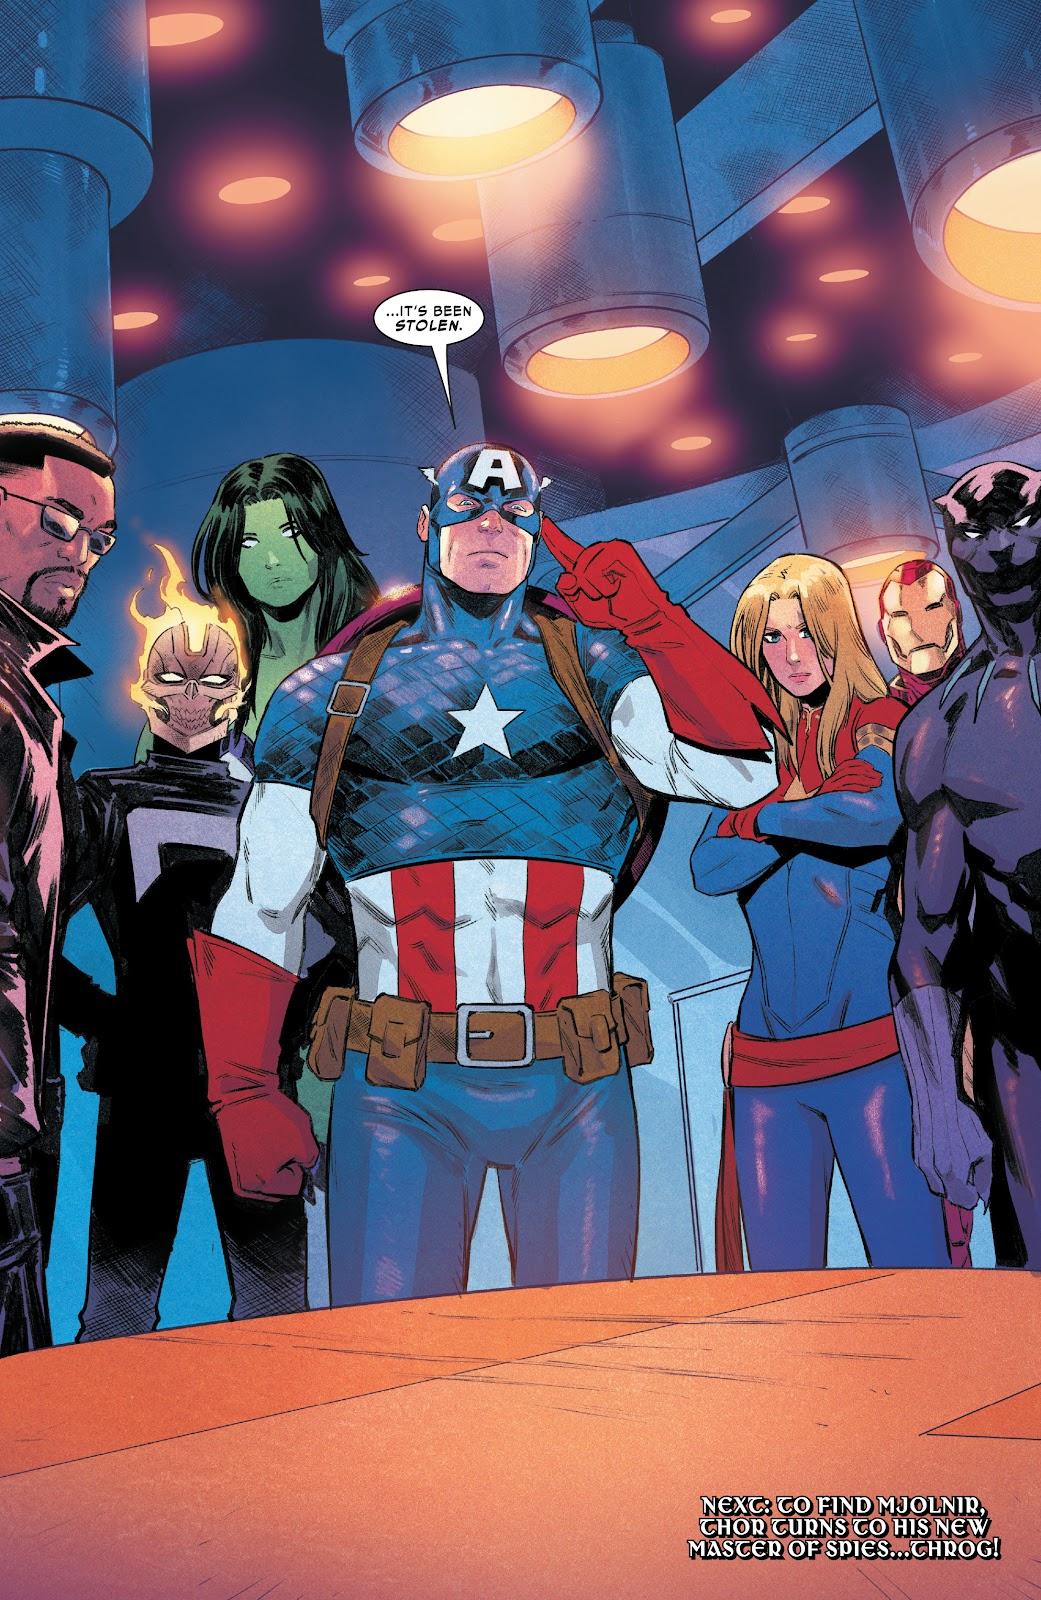 The Avengers (Thor Vol. 6 #17)